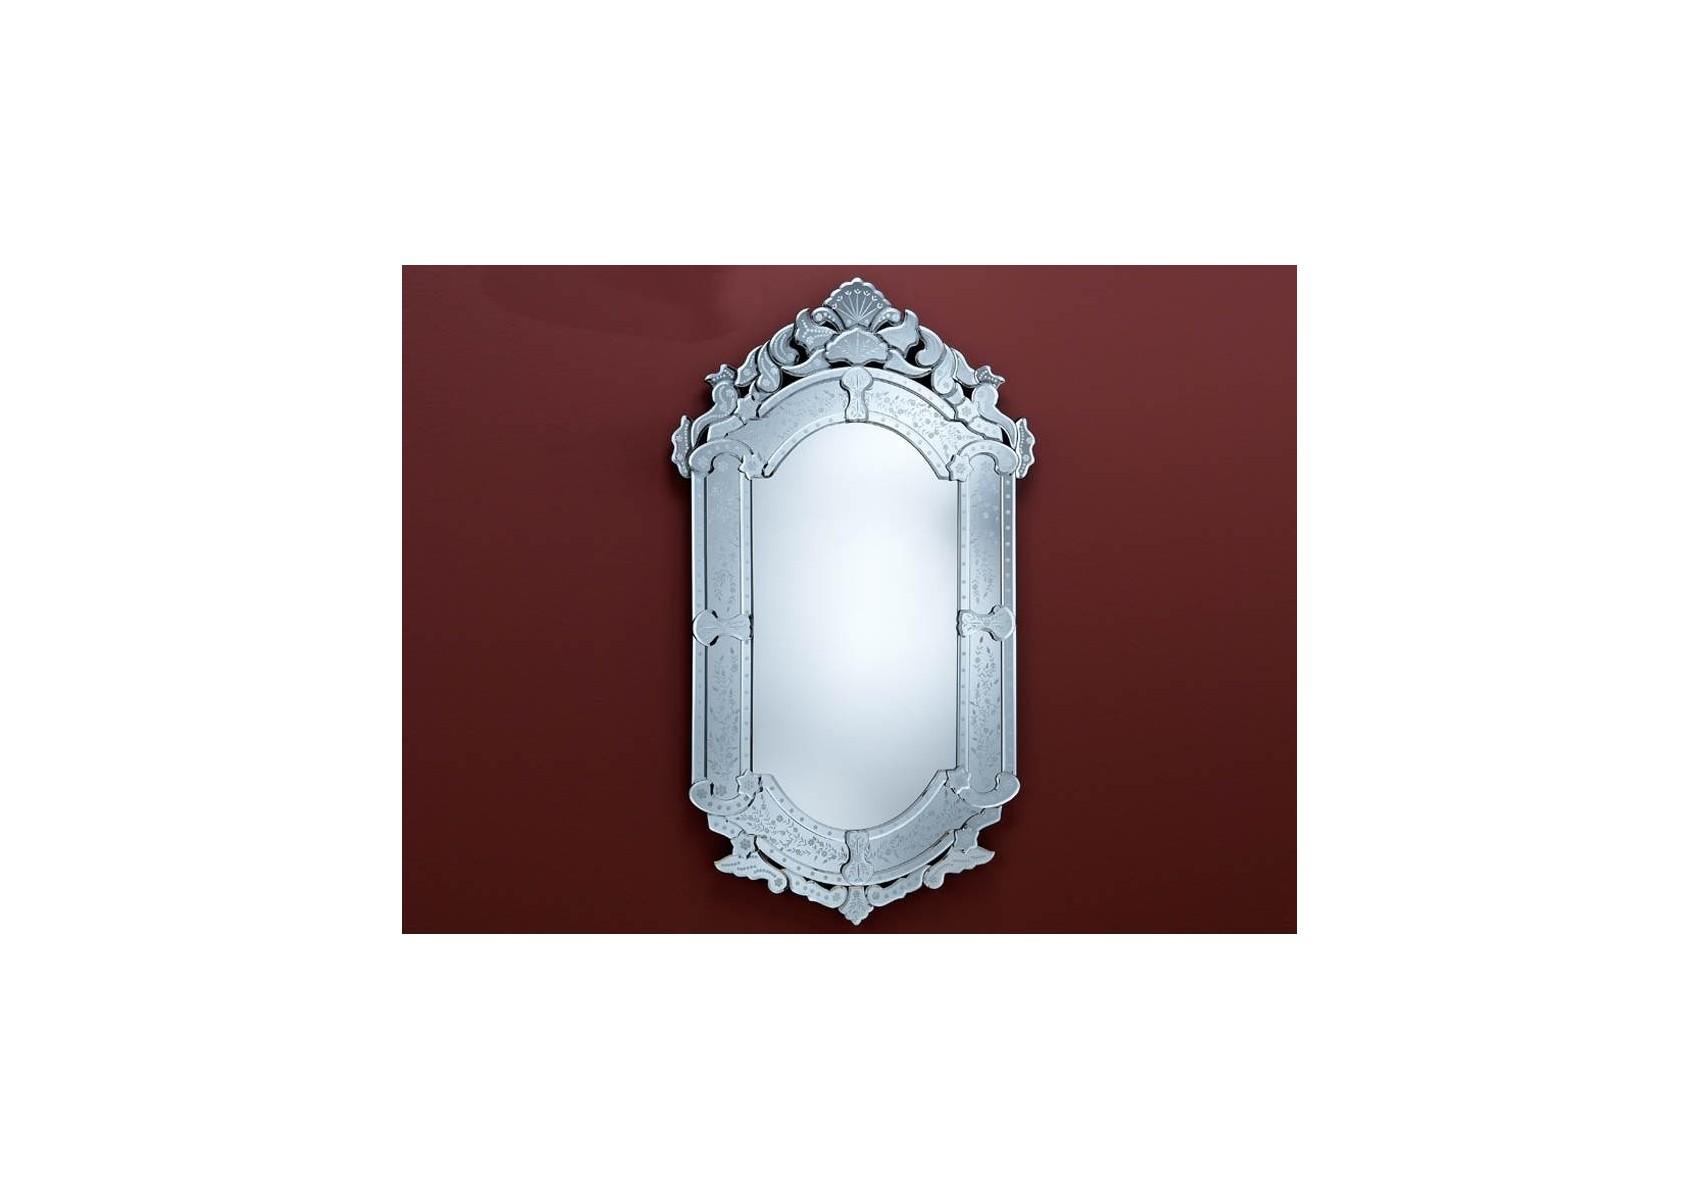 Miroir original design - IMPERIO - deco schuller